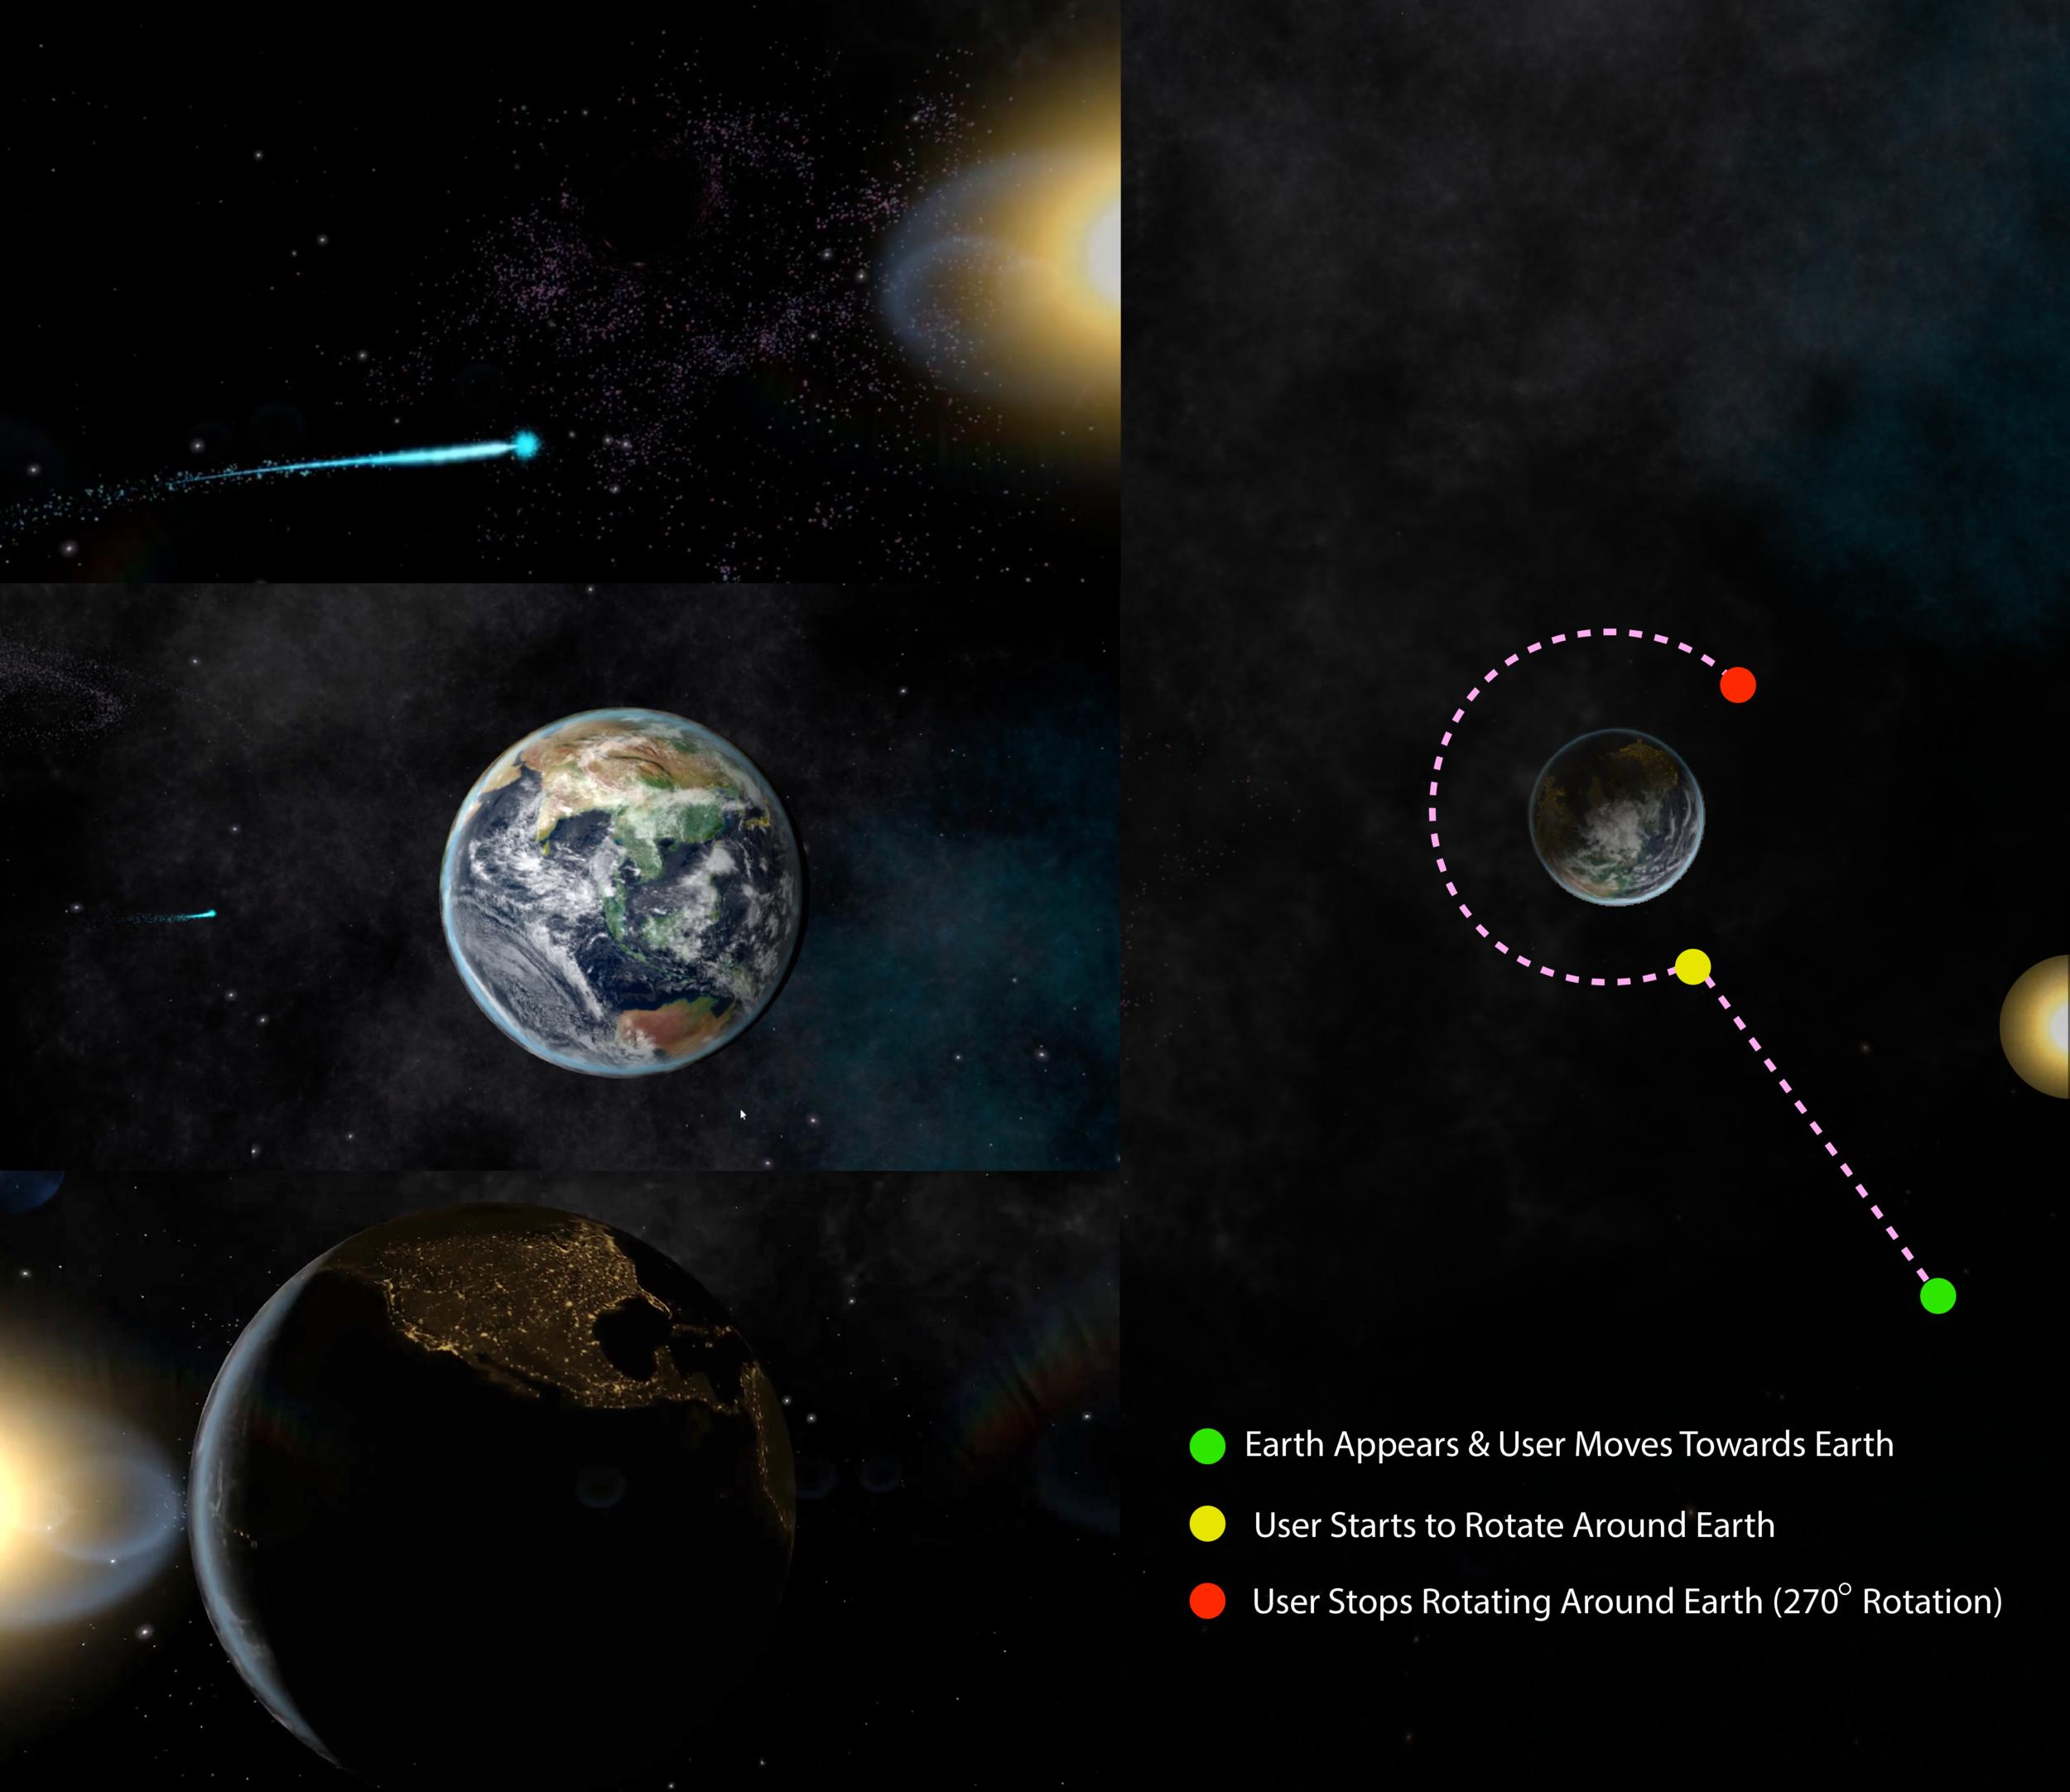 Earthgaze_Diagram